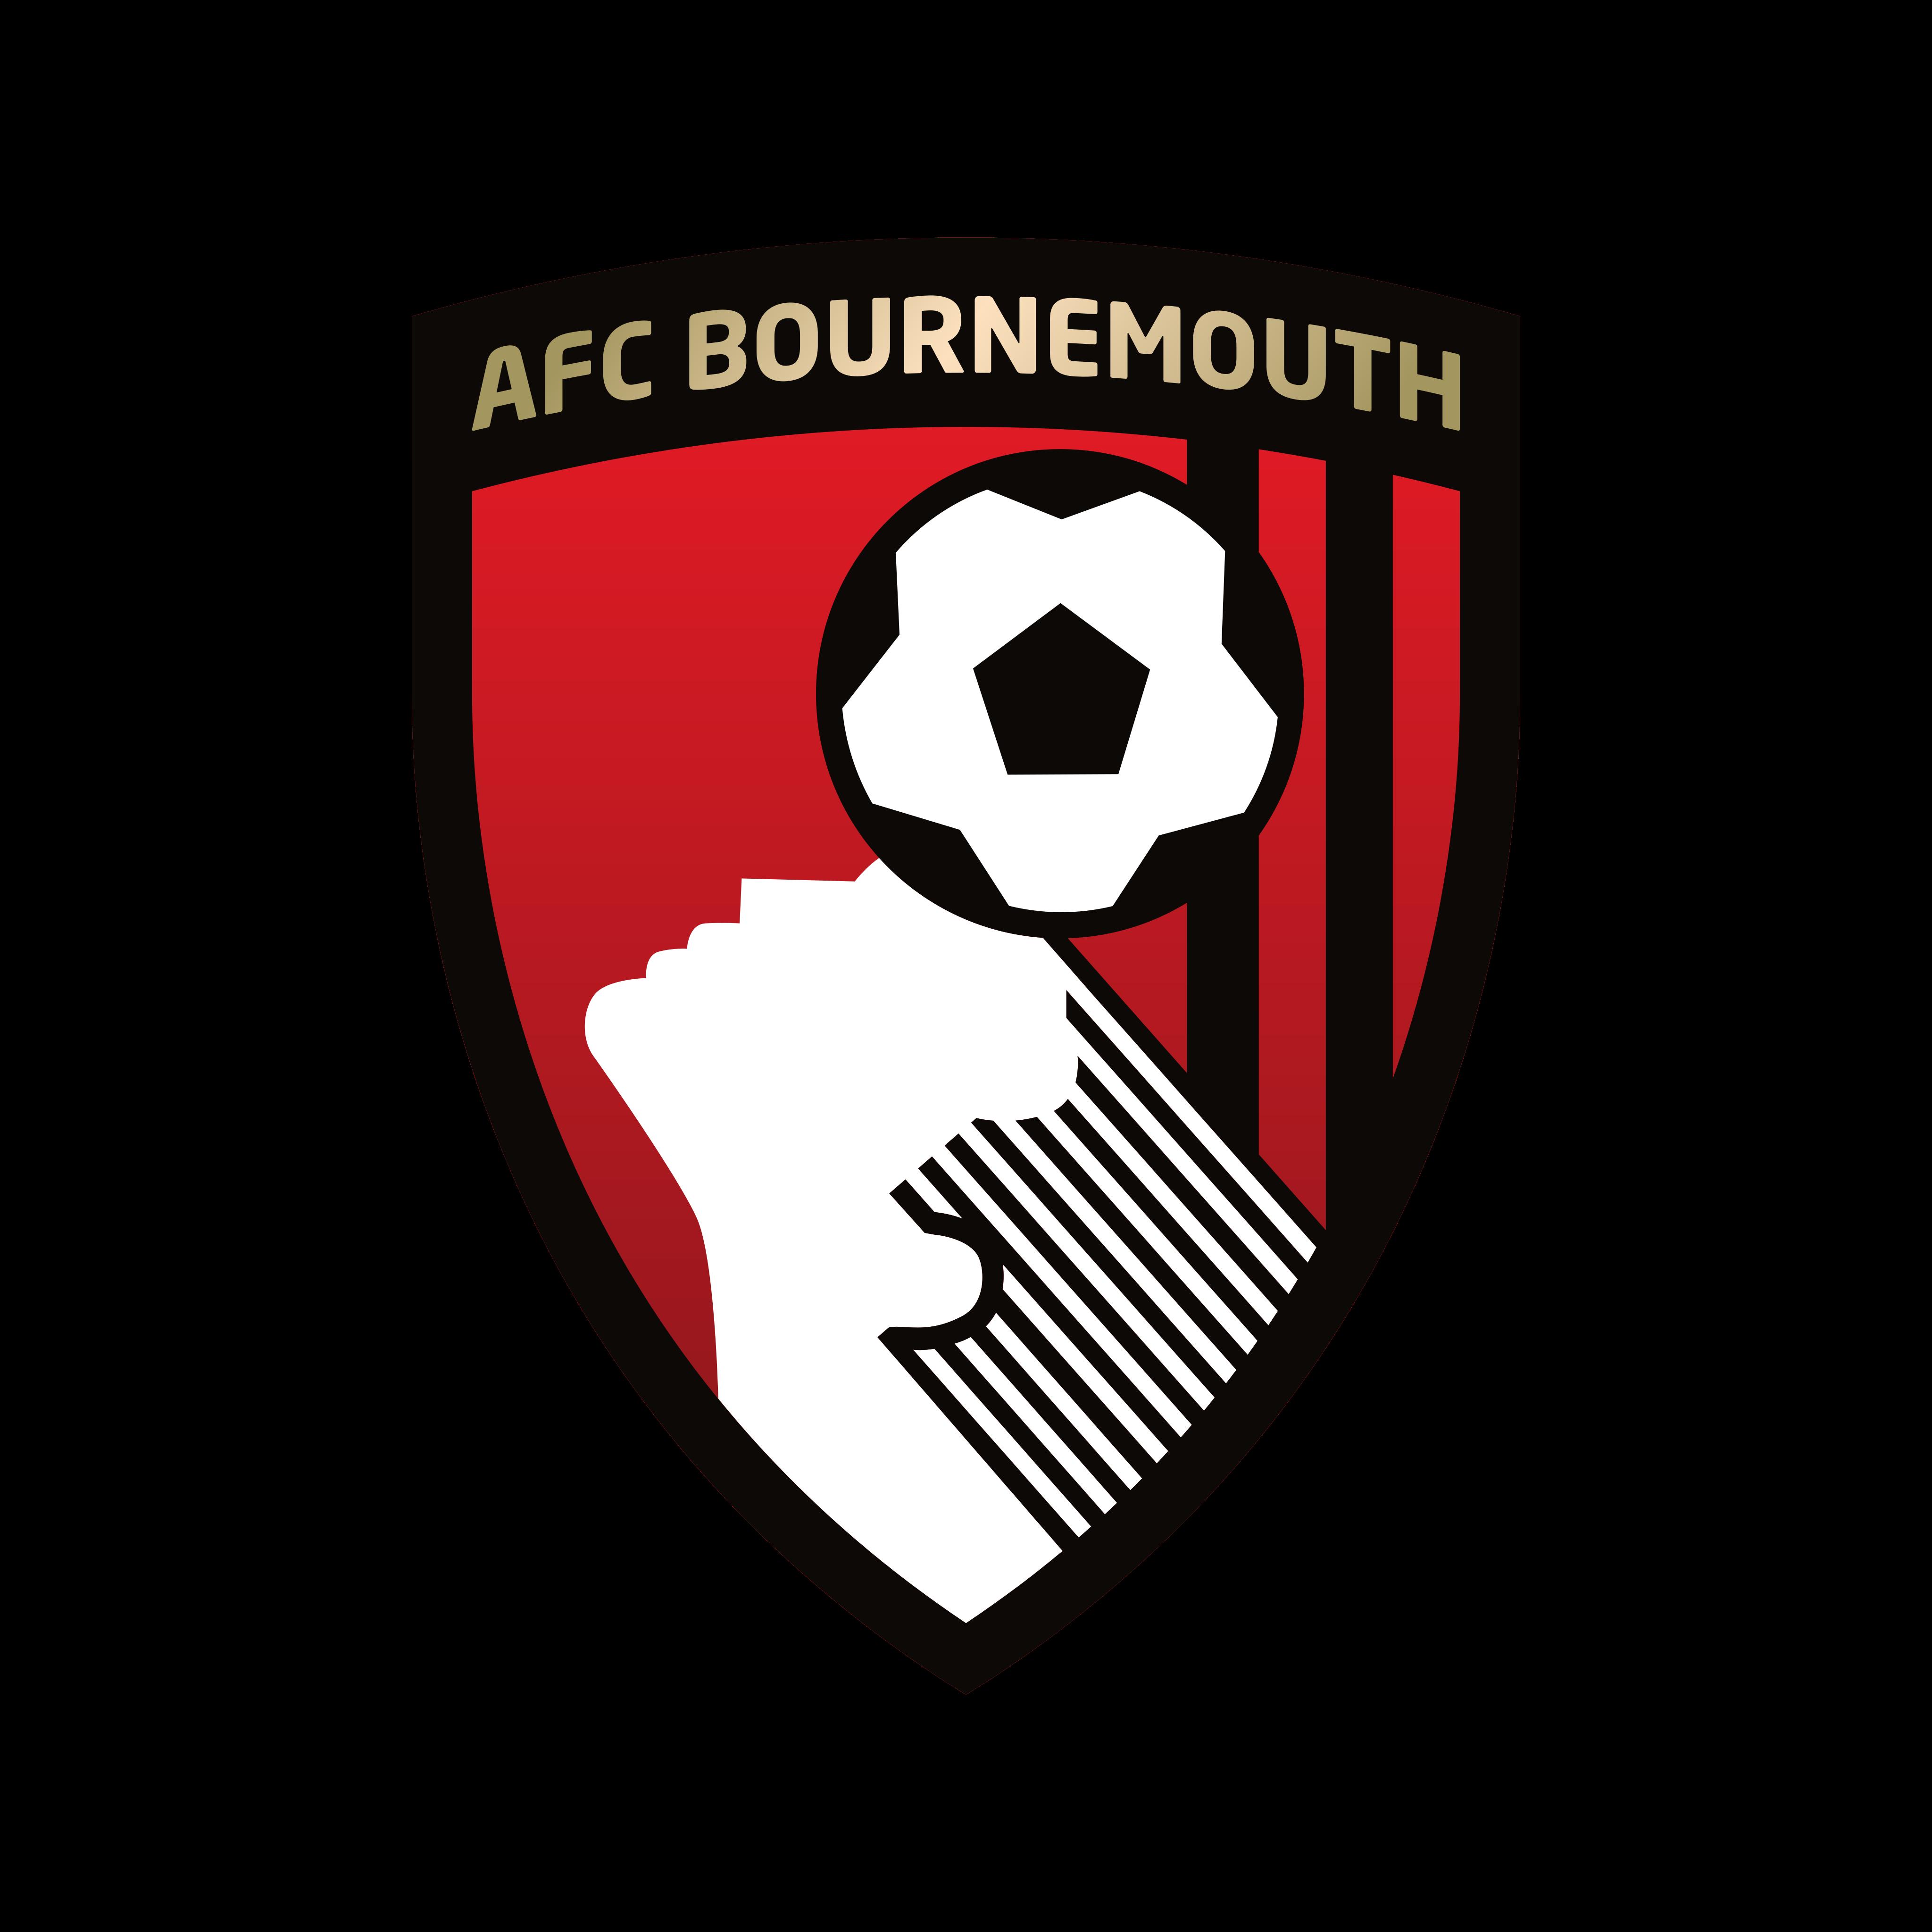 bournemouth fc logo 0 - AFC Bournemouth Logo